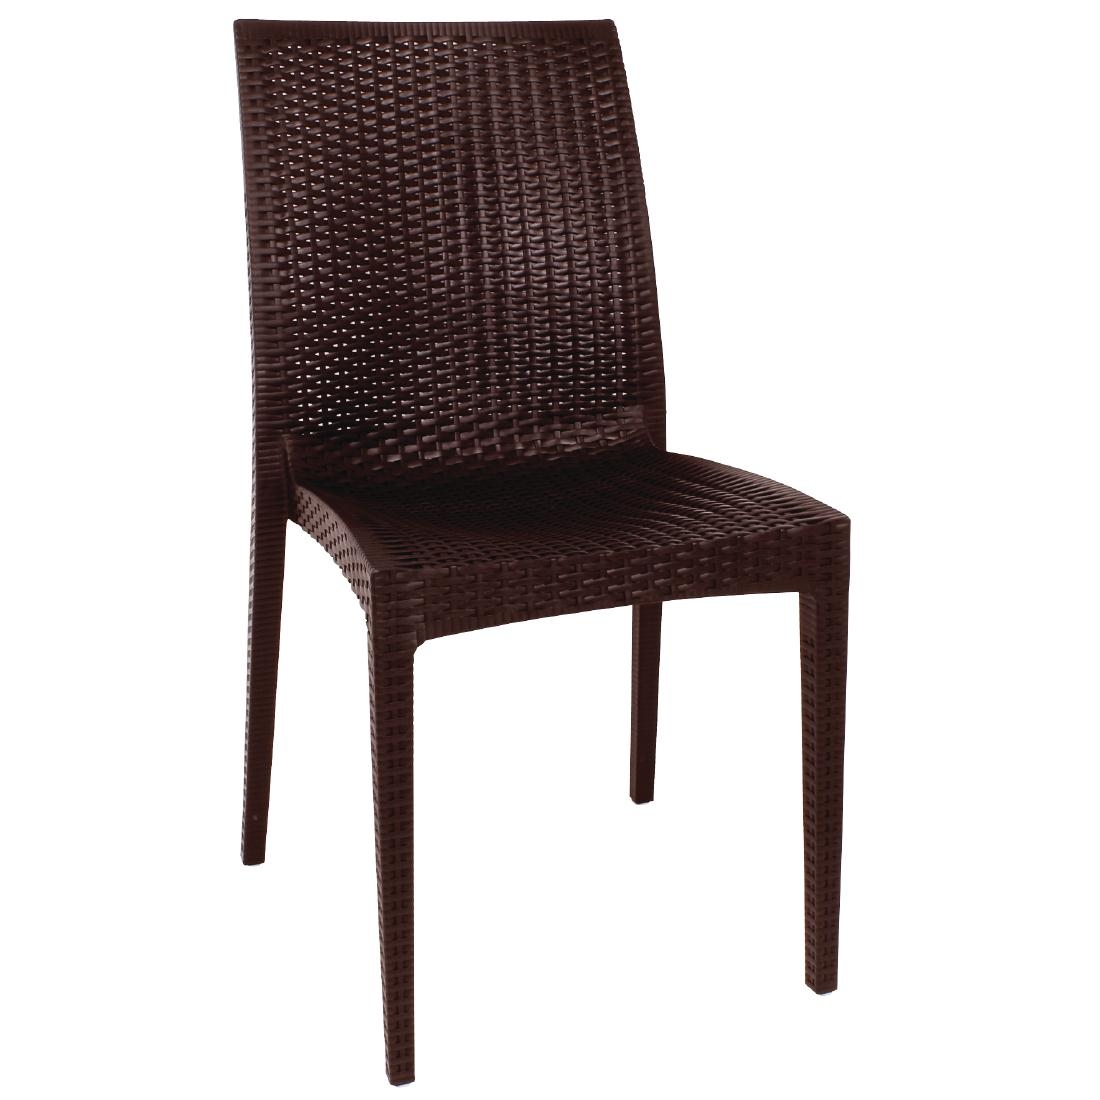 Outdoor stuhl krista 190st braun g nstig kaufen m bel star - Outdoor stuhle stapelbar ...